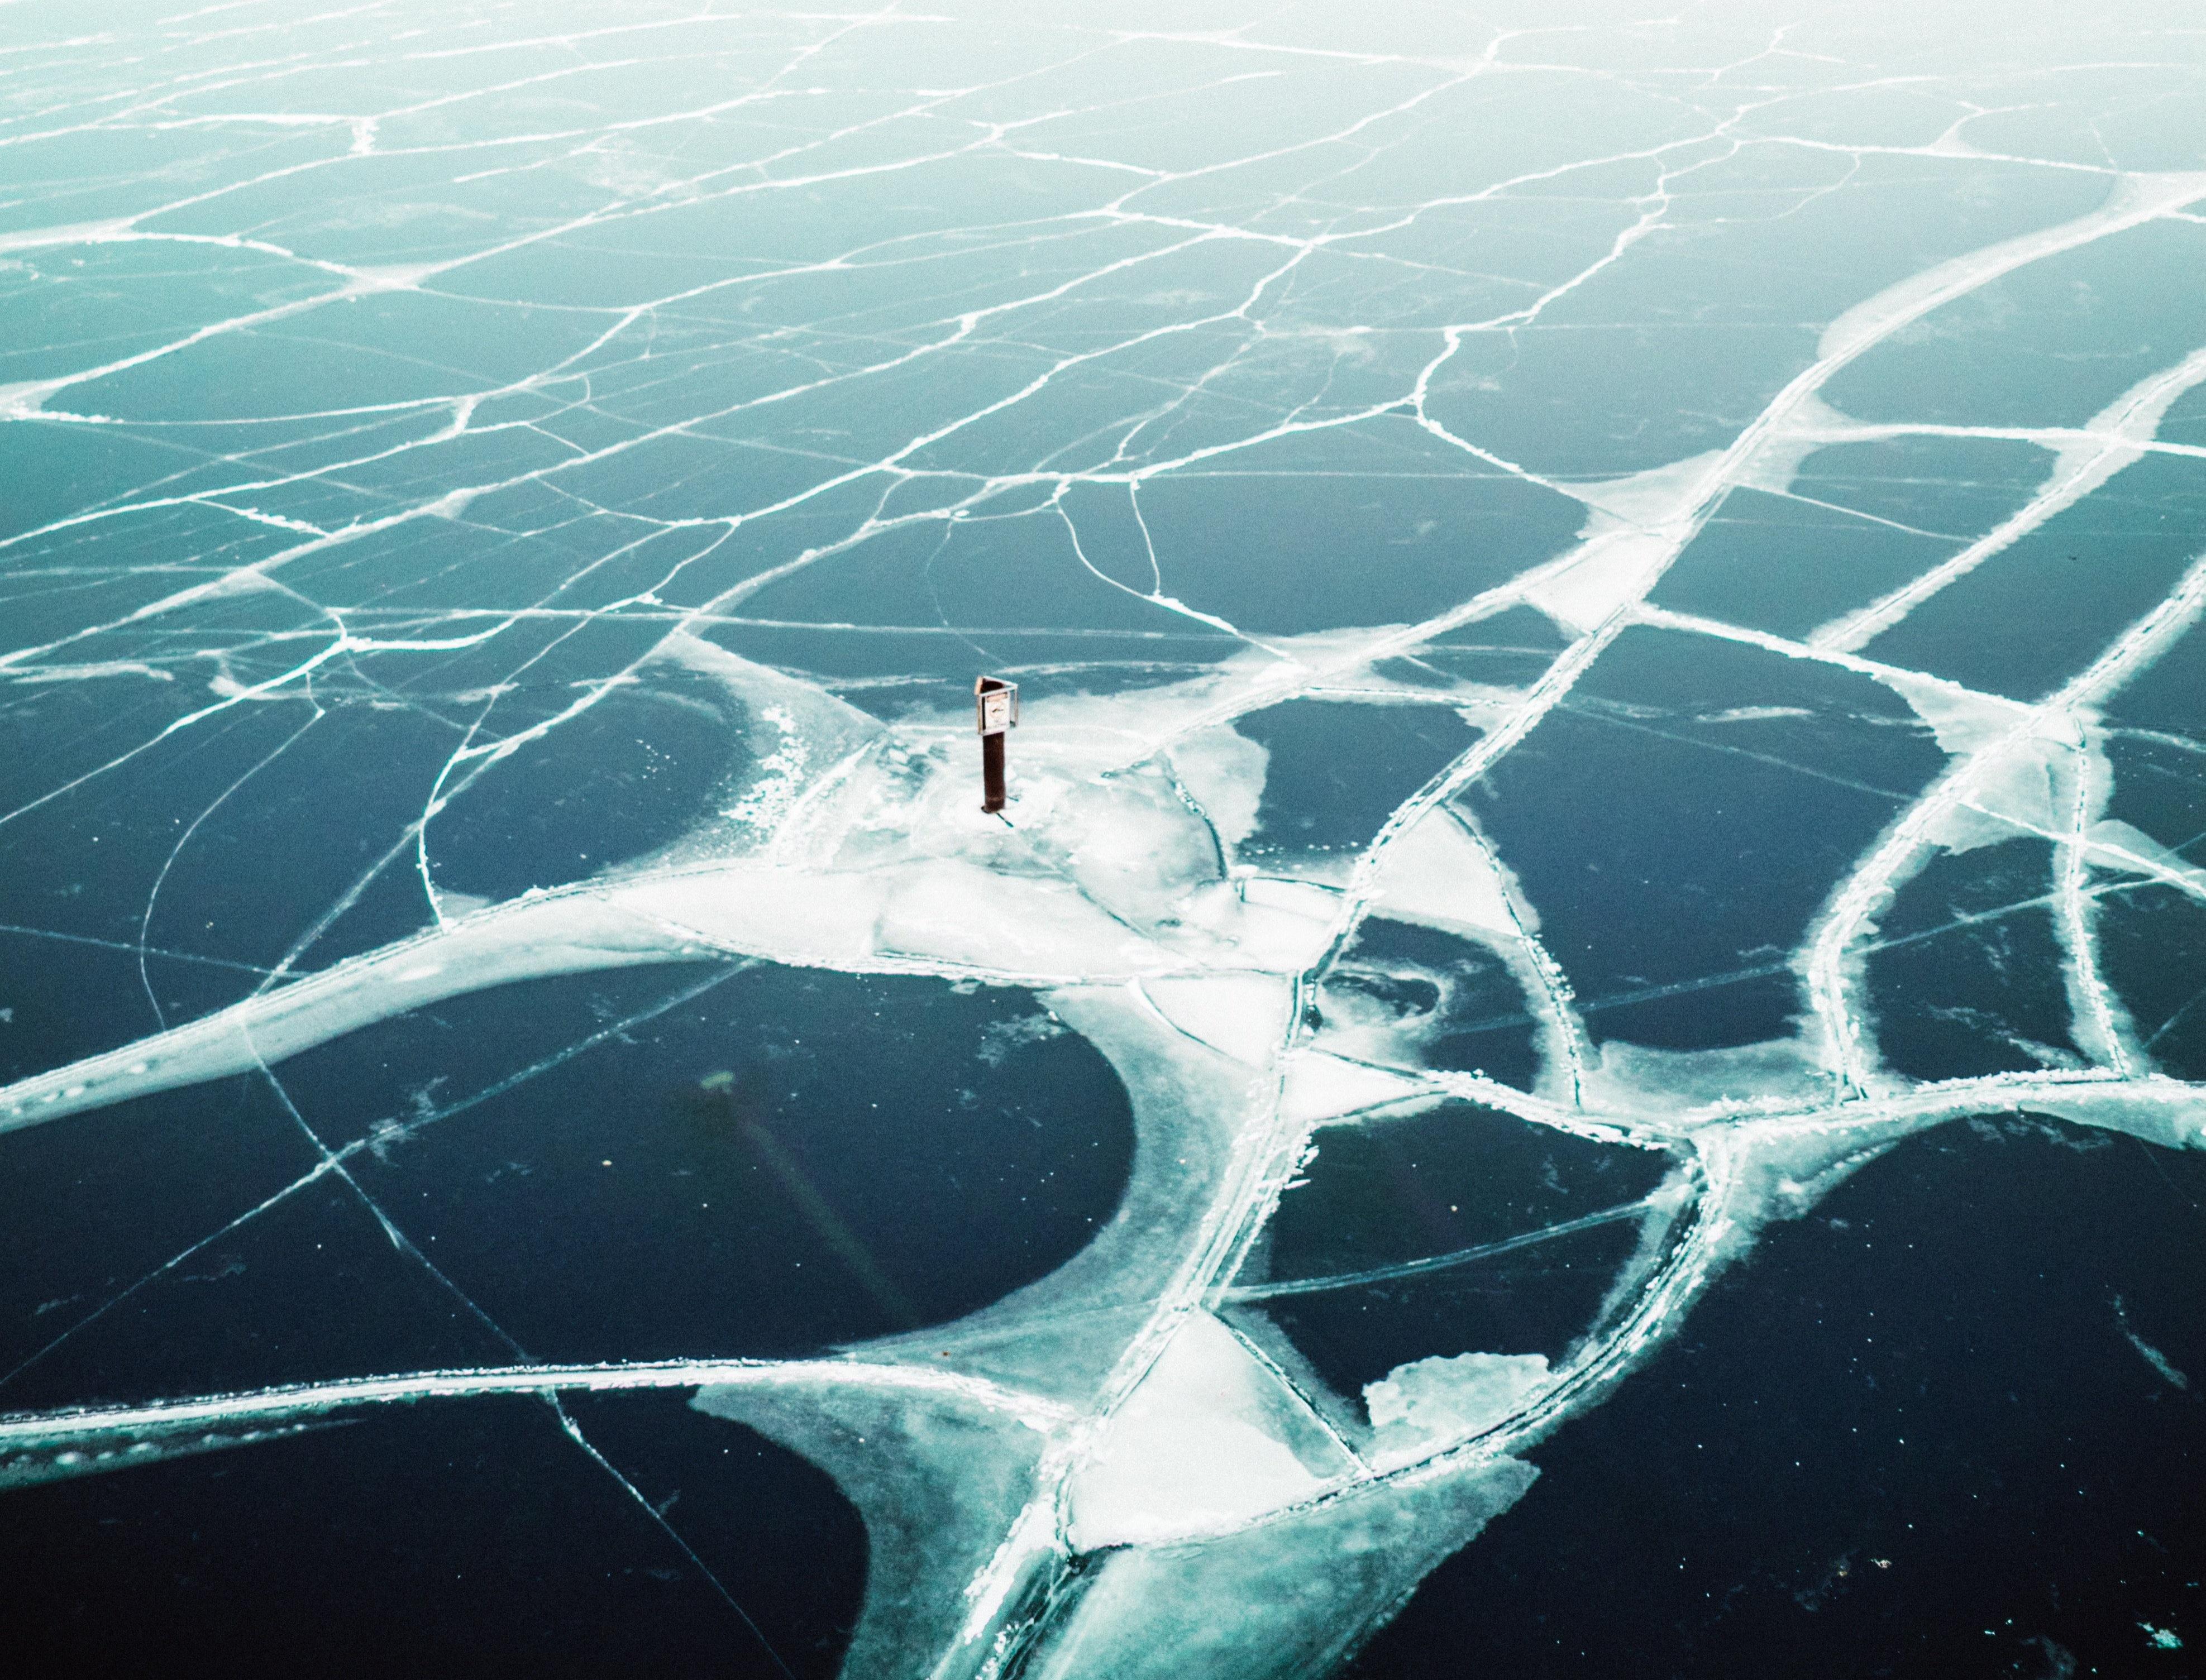 Leadership Training Games: 6 Quick Ways to Break the Ice